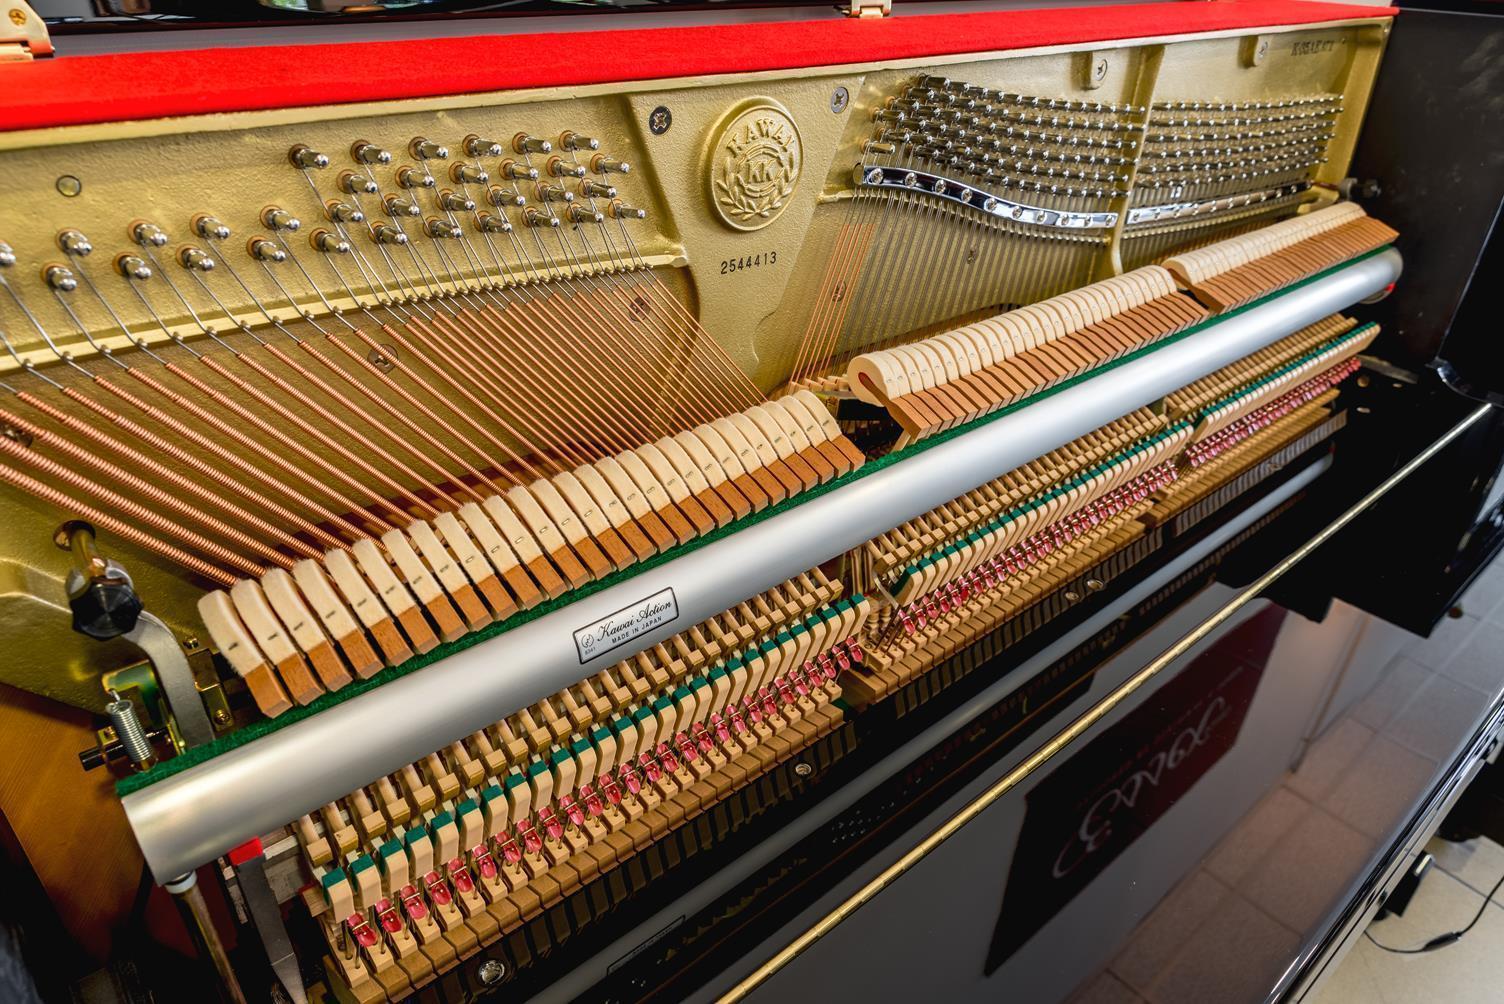 KAWAI-K35-Silent-2544413 mecánica piano cuerdas martillos clavijero clavijas